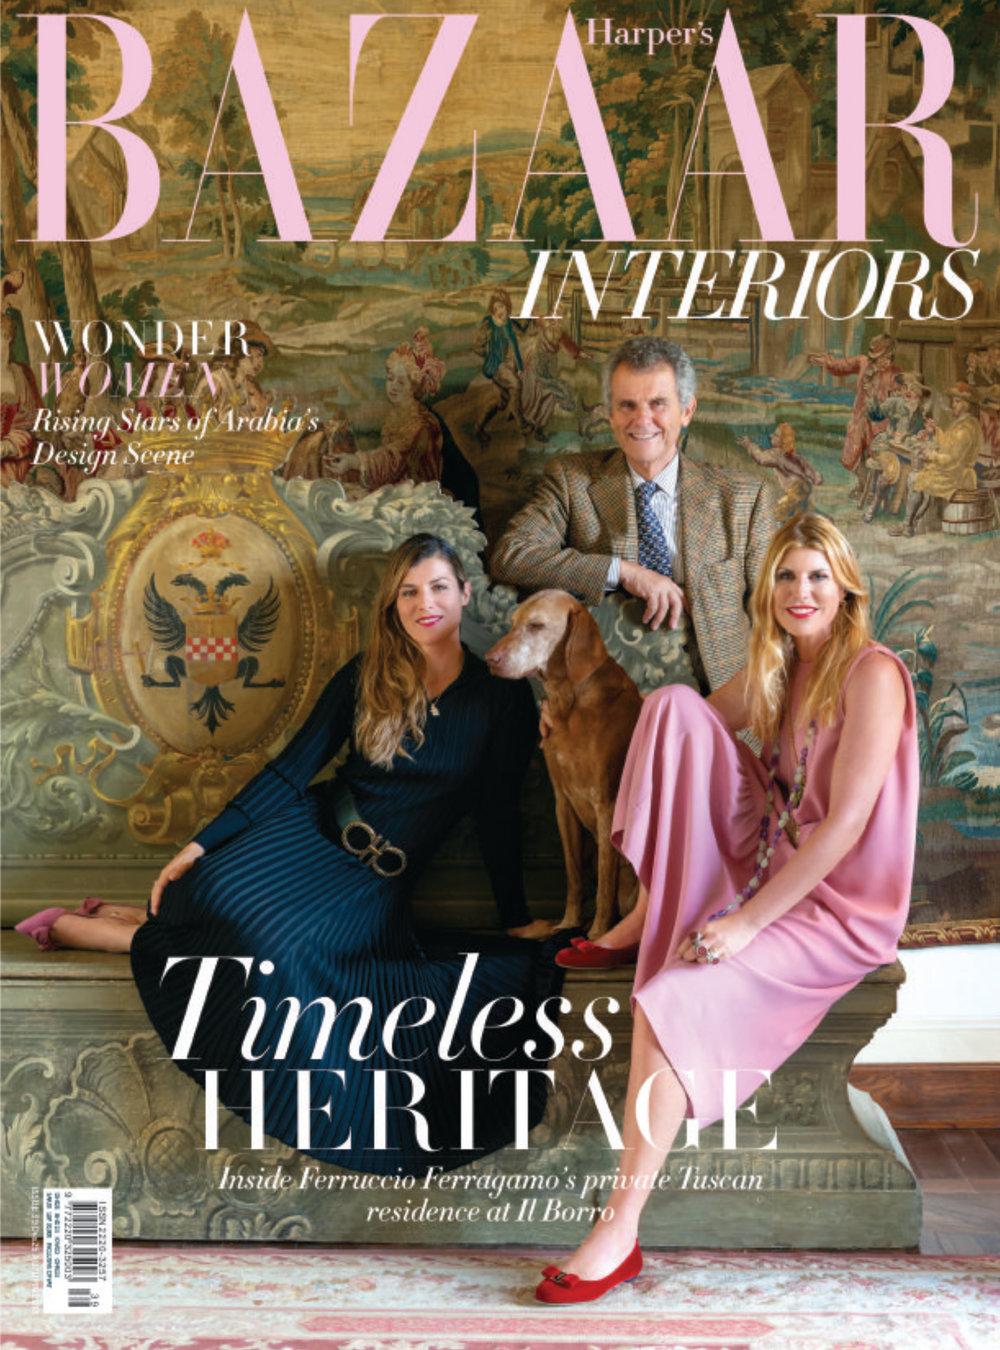 Harper's Bazaar Autumn 2018